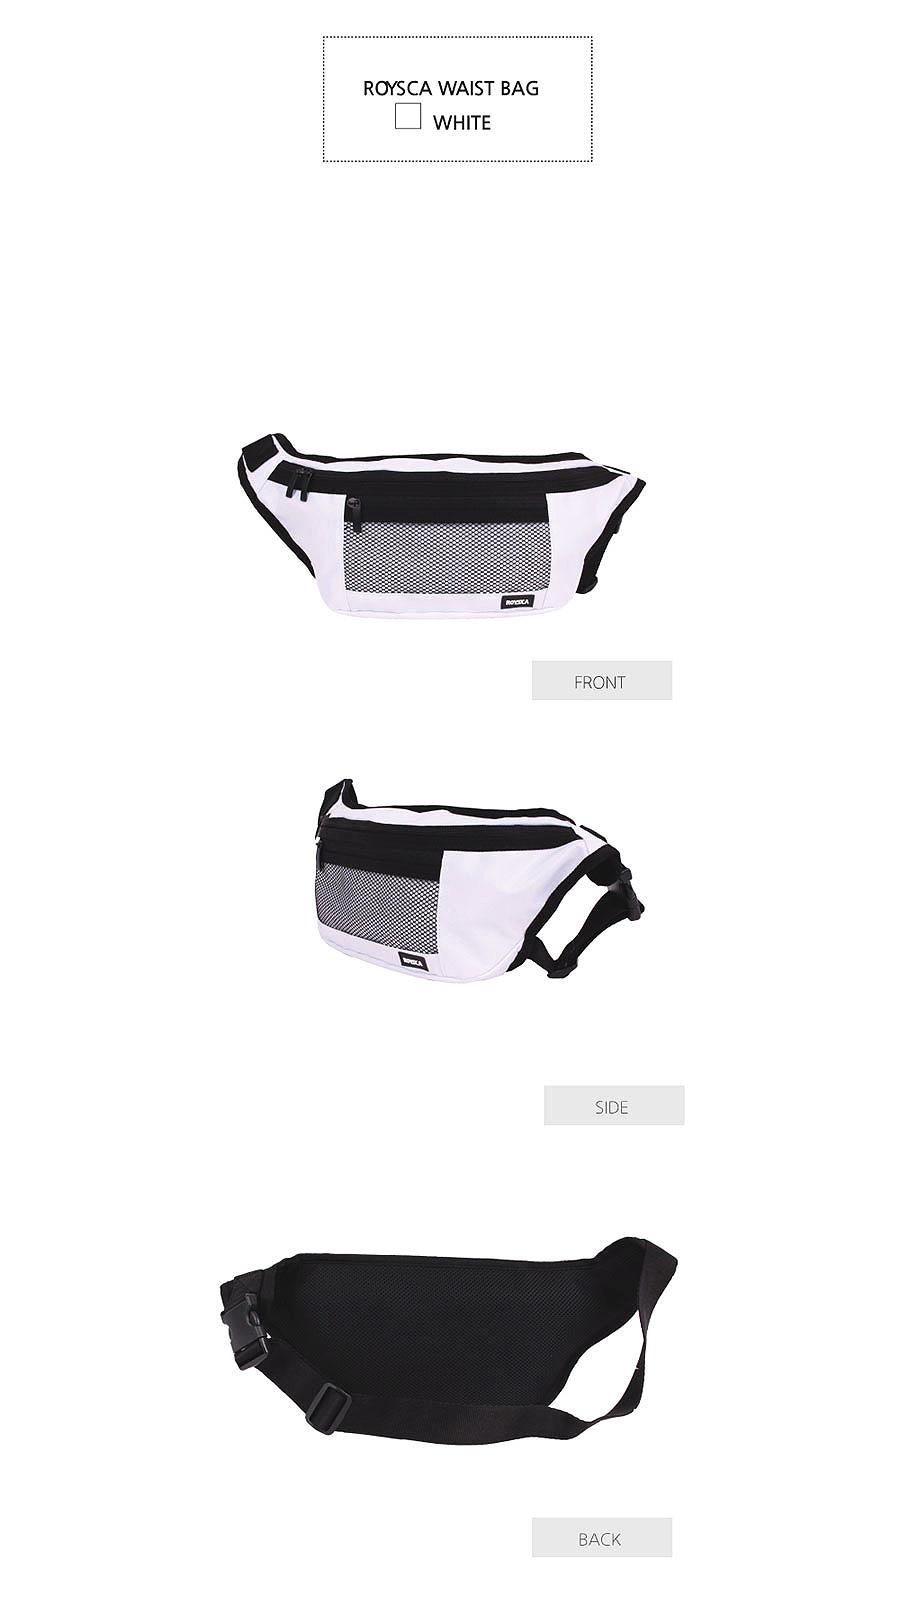 MASH WAIST BAG-WHITE - 로이스카, 39,000원, 크로스백, 패브릭크로스백